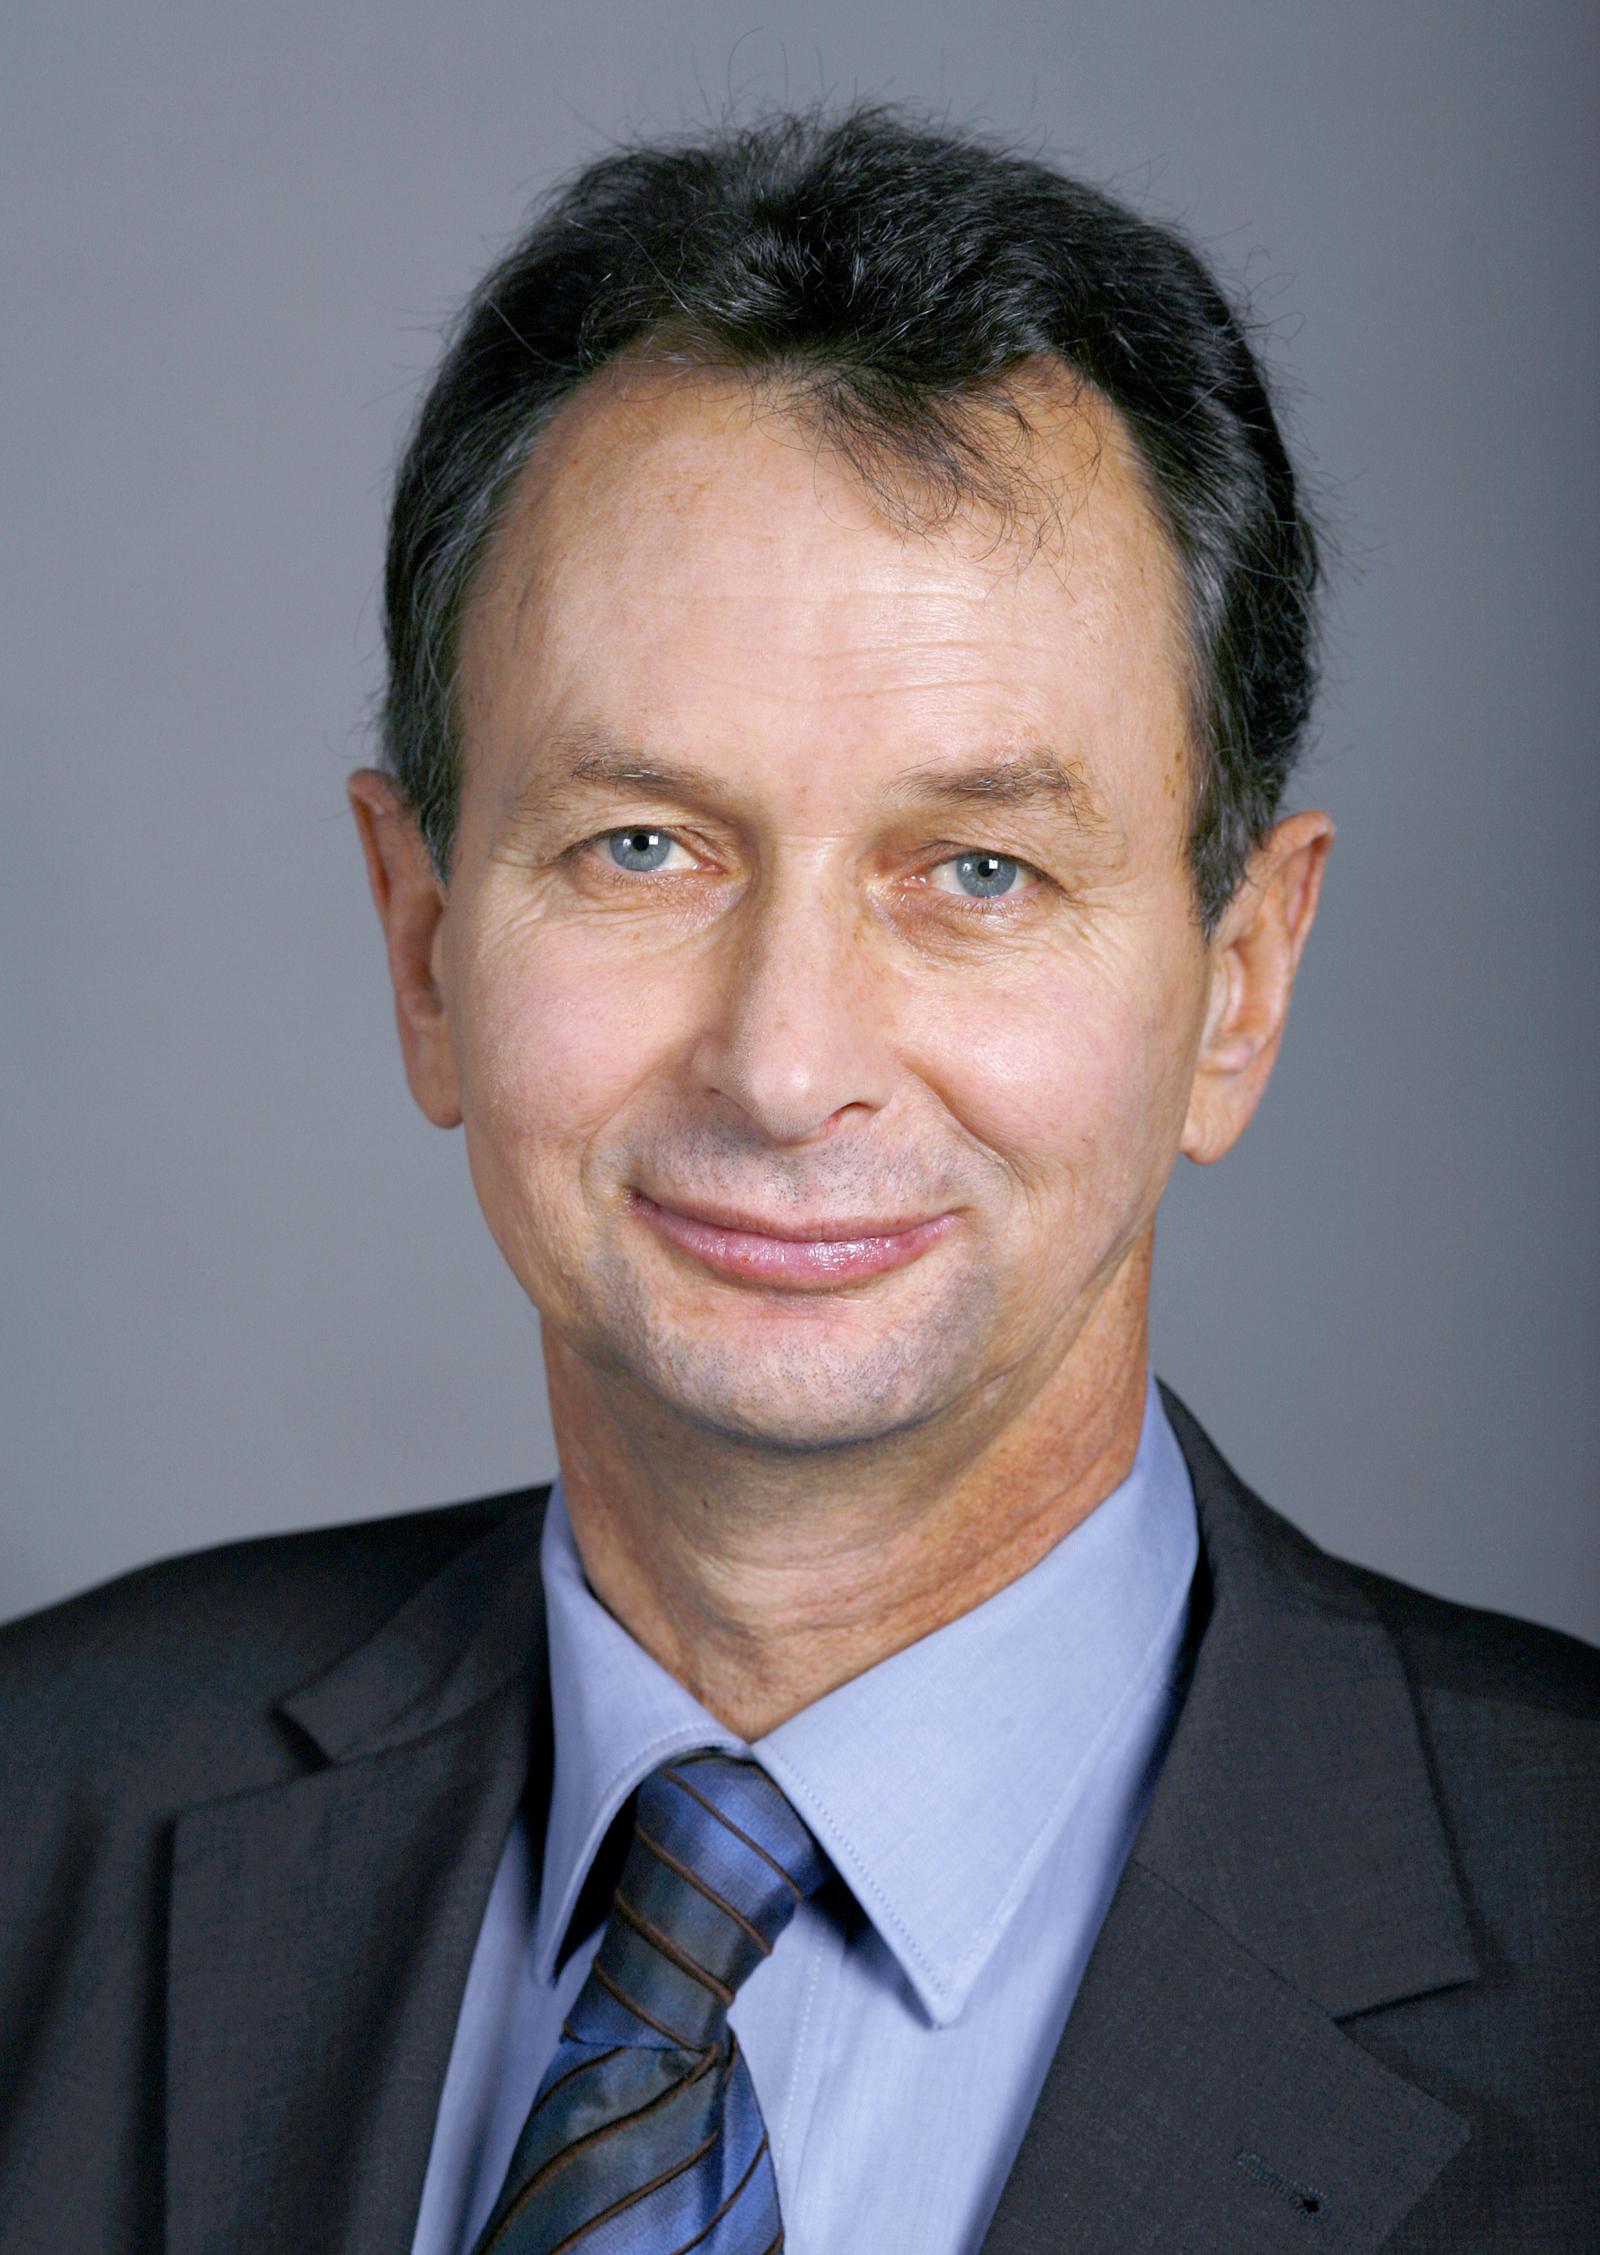 Philip Müller